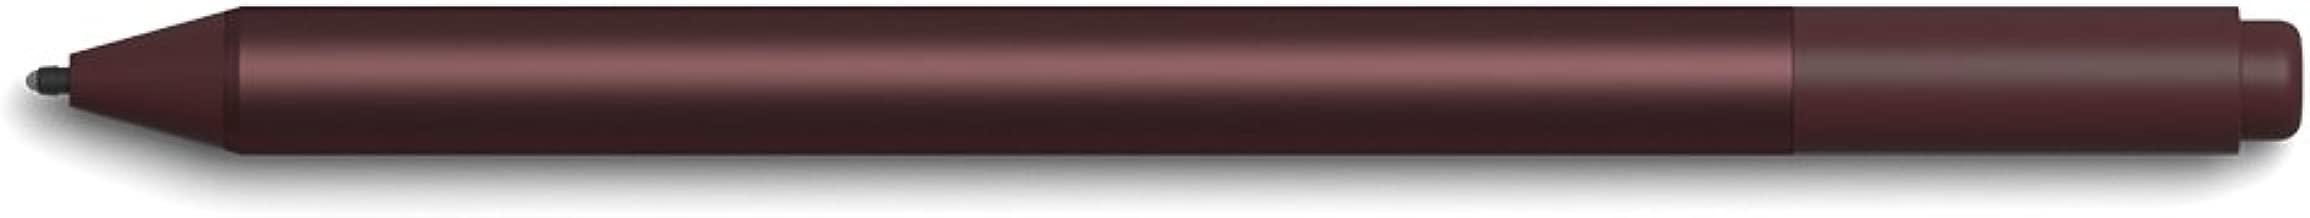 Microsoft Surface Pen - Burgundy